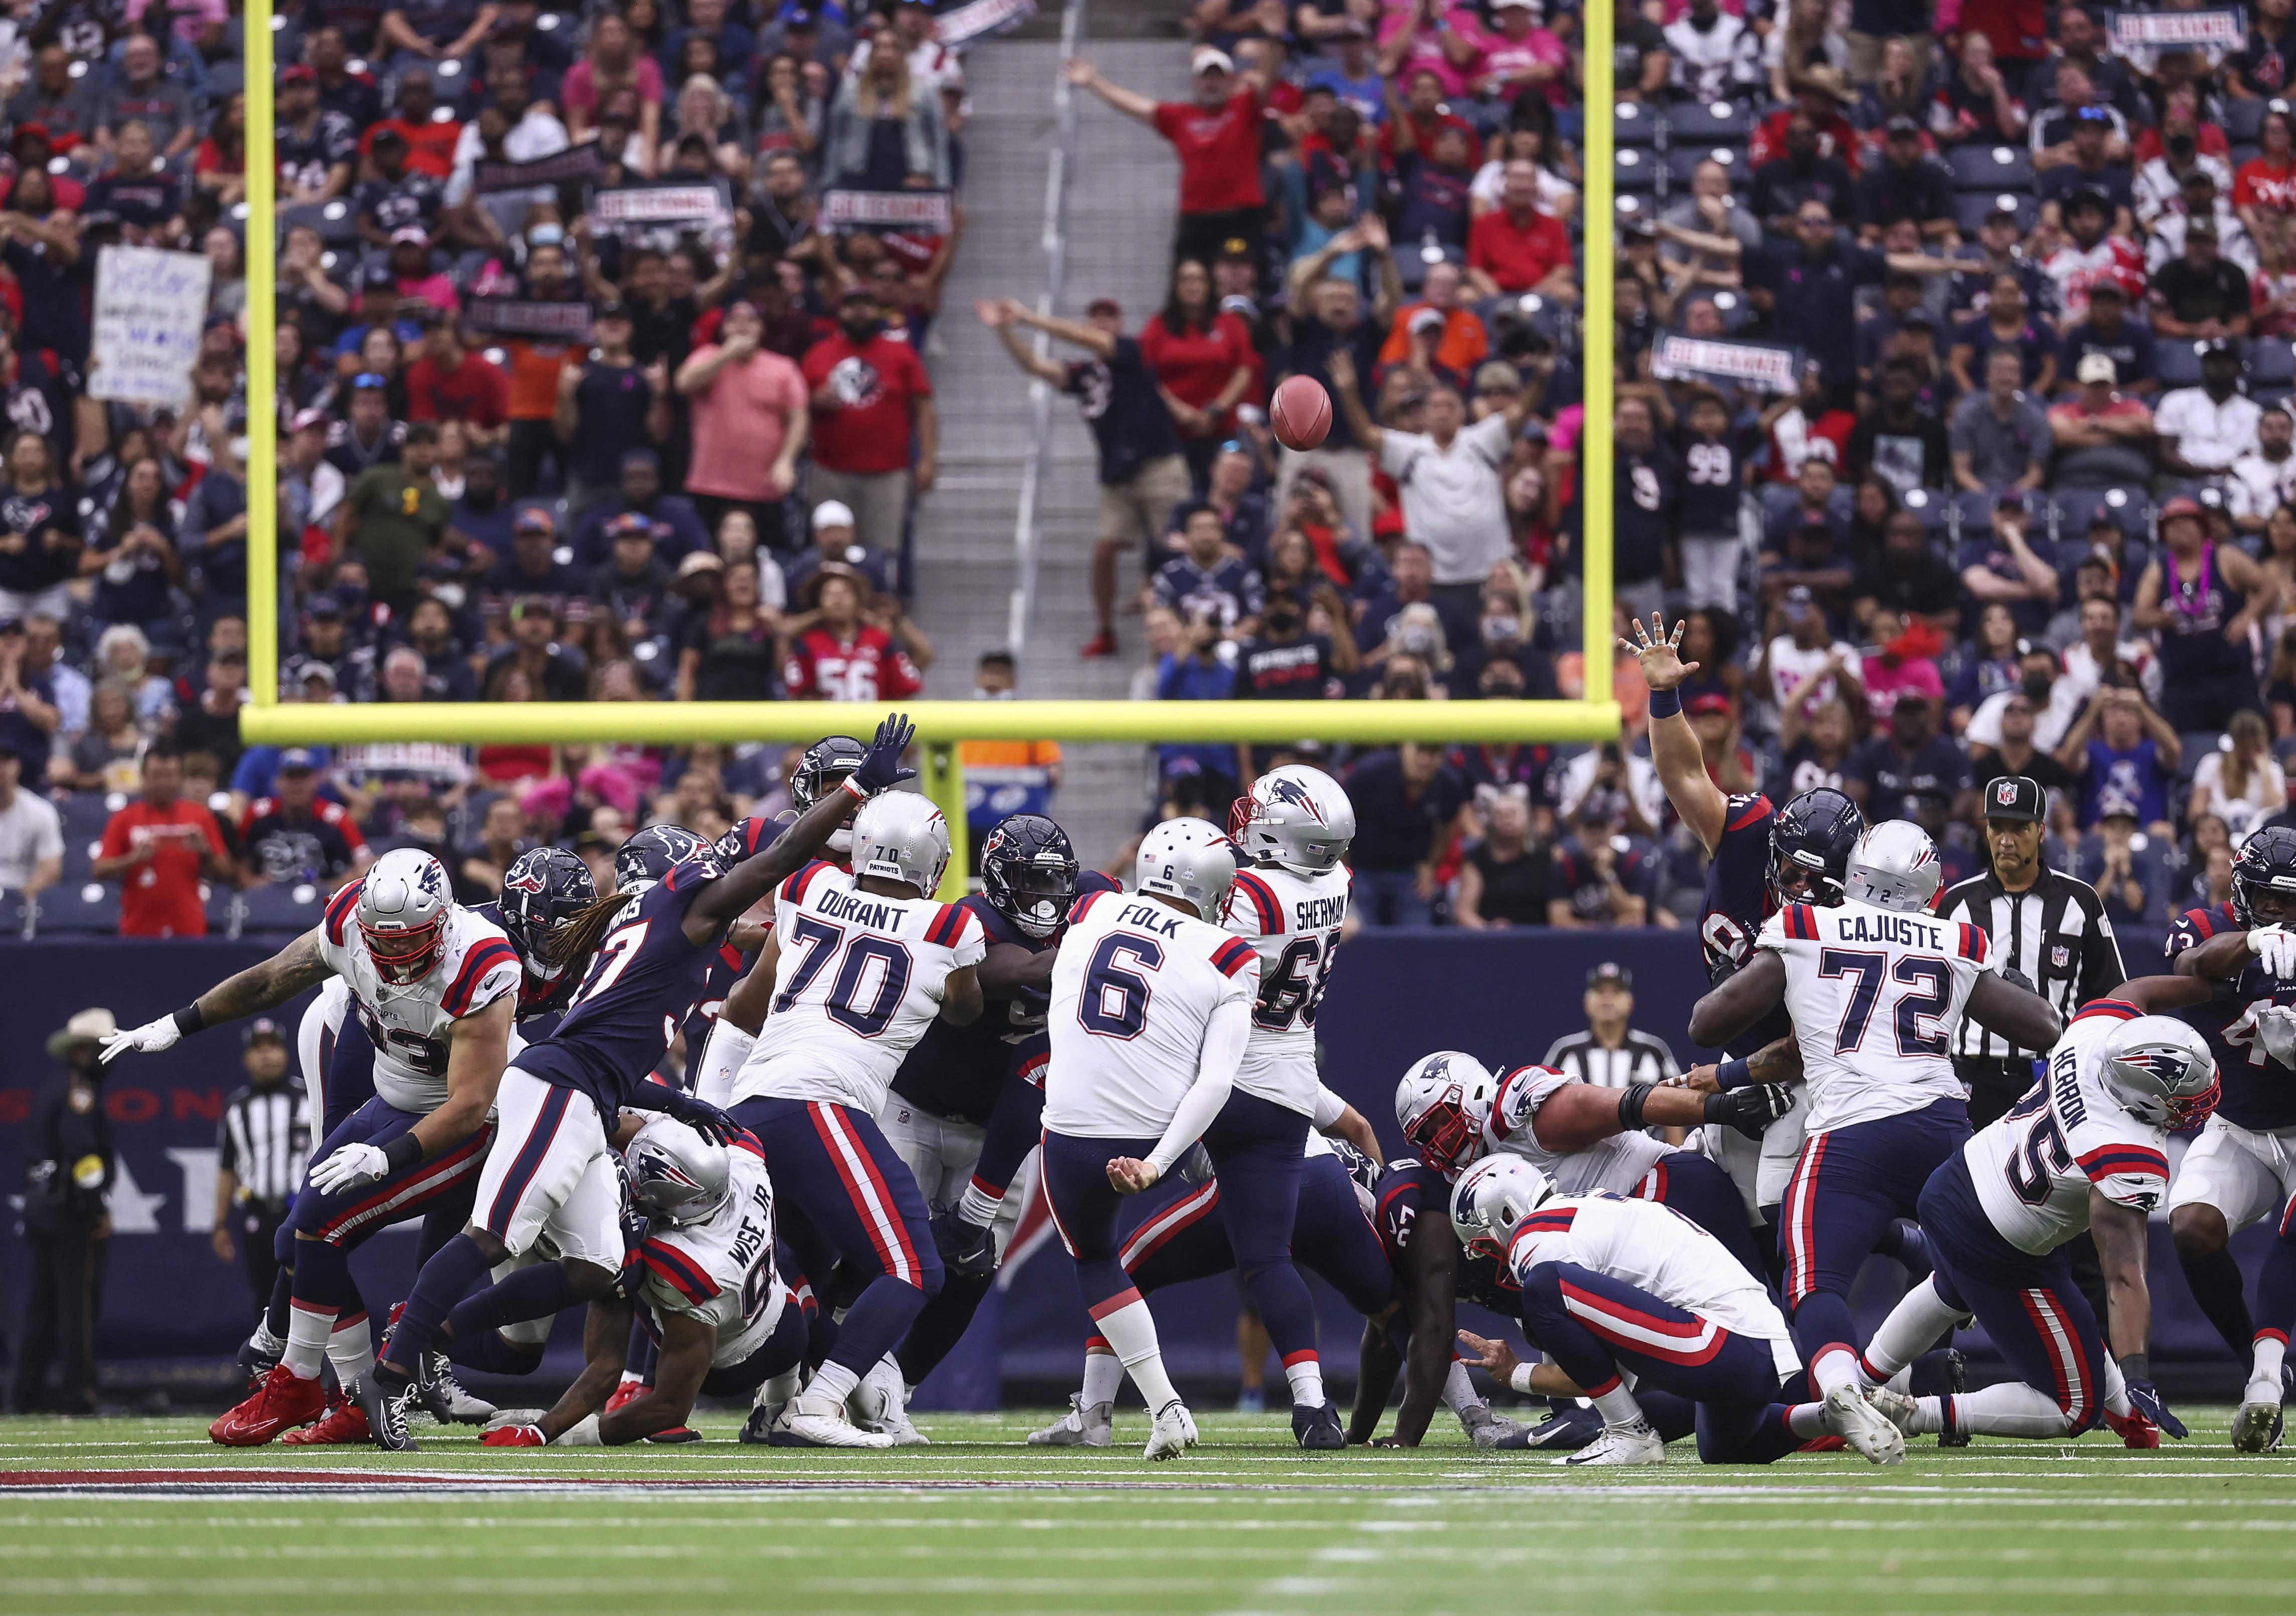 NFL: New England Patriots at Houston Texans